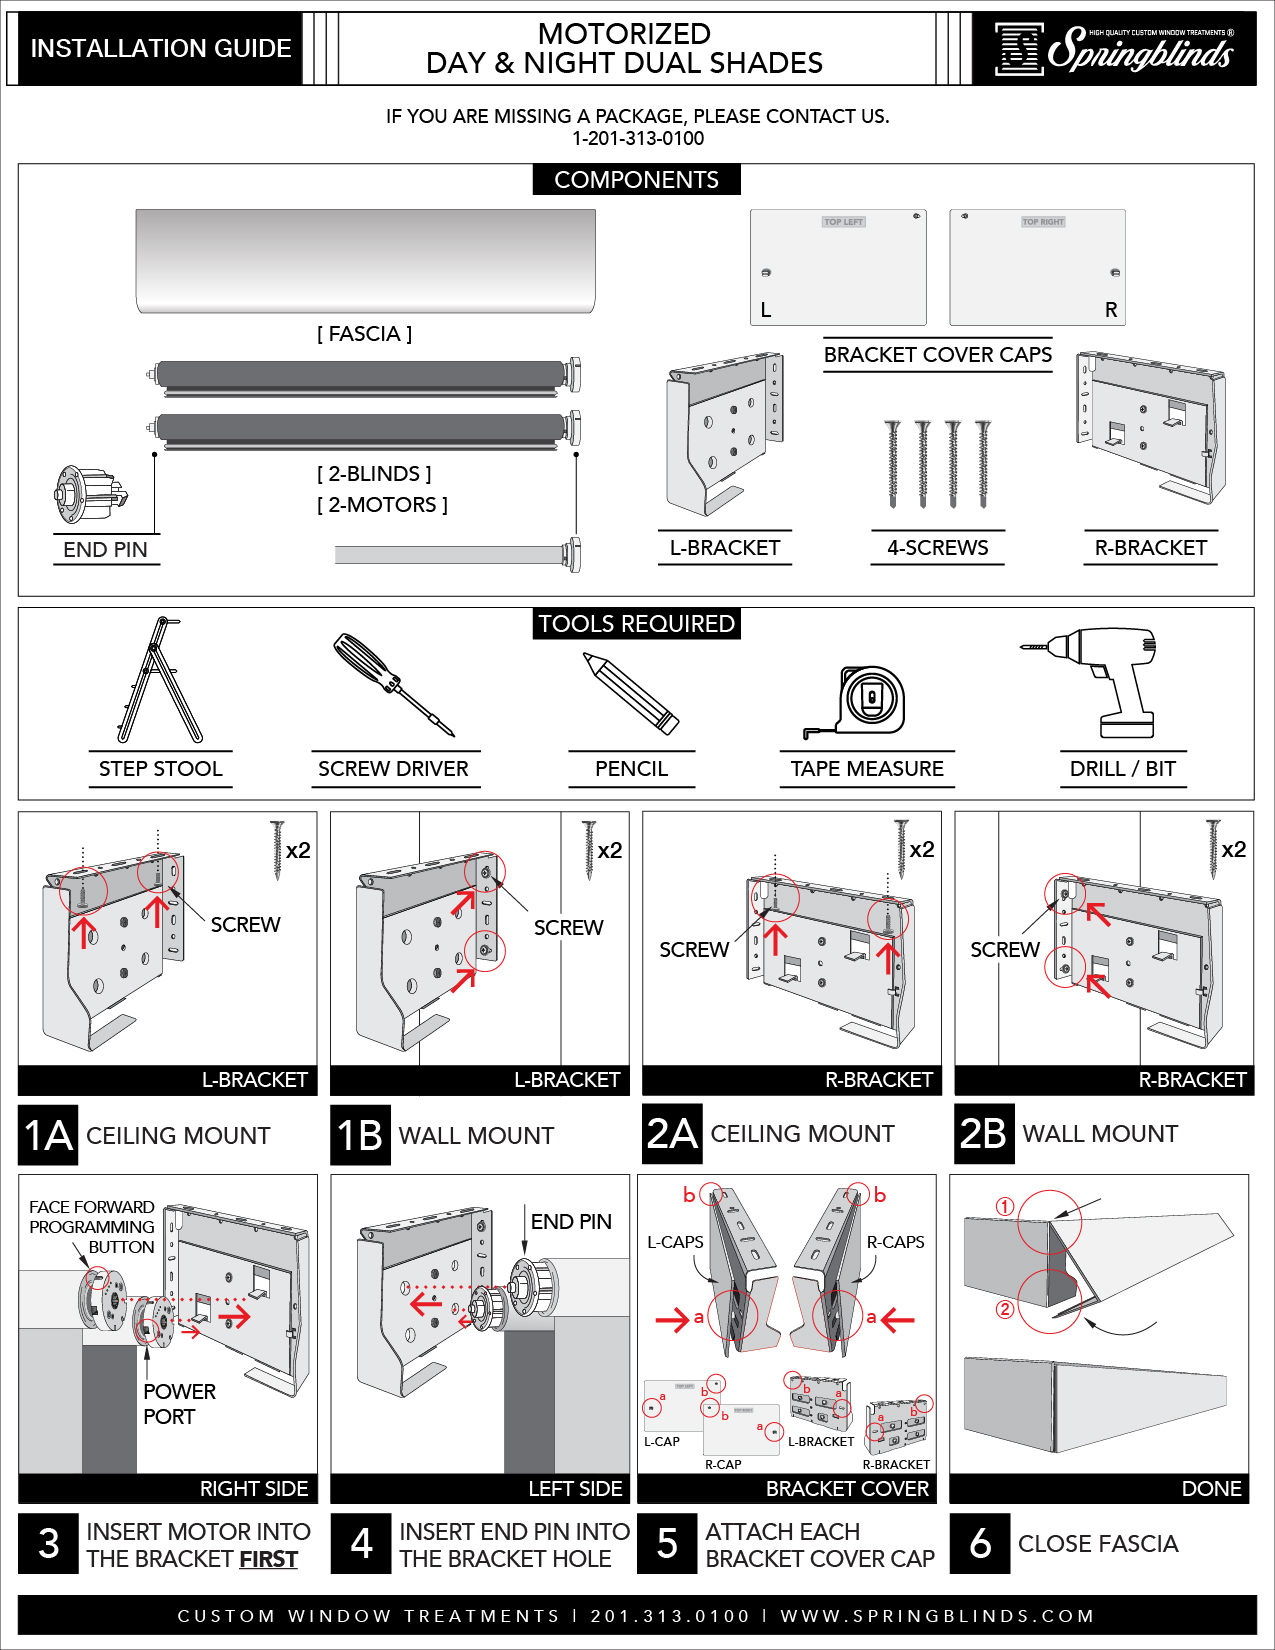 motorized-day-night-dual-shade-installation-guide.jpg